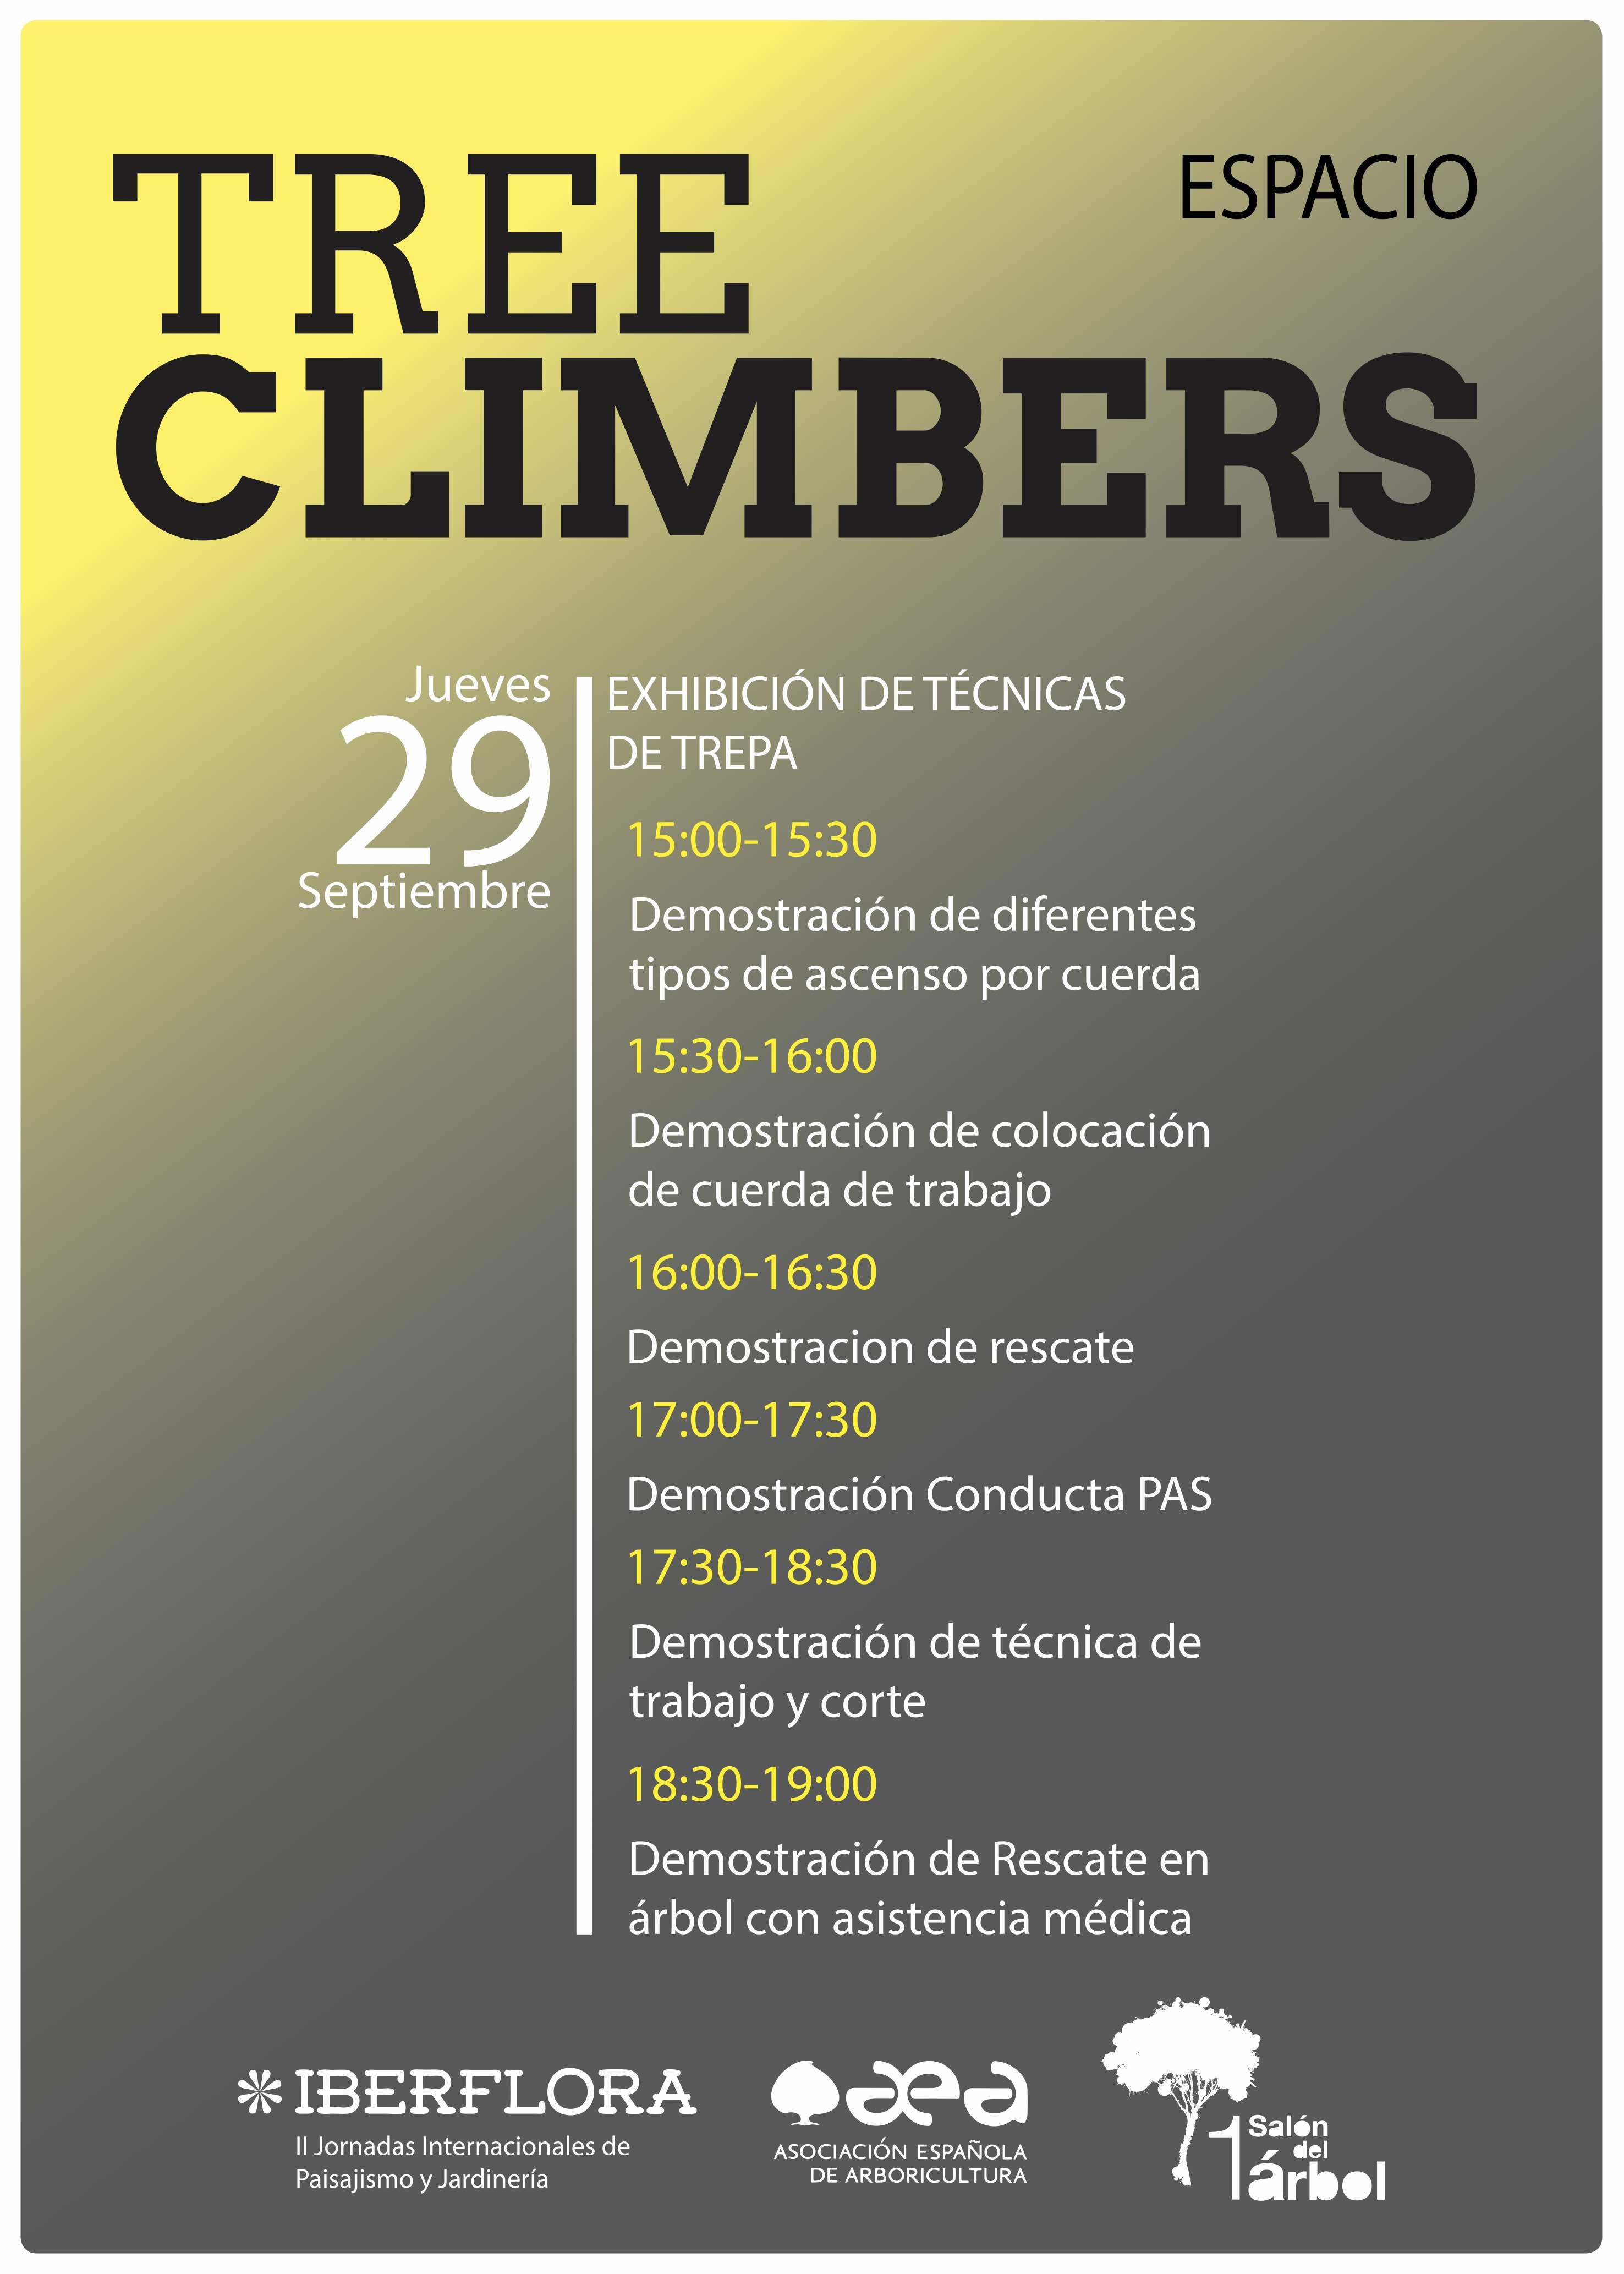 treeclimbers-100x140-totem